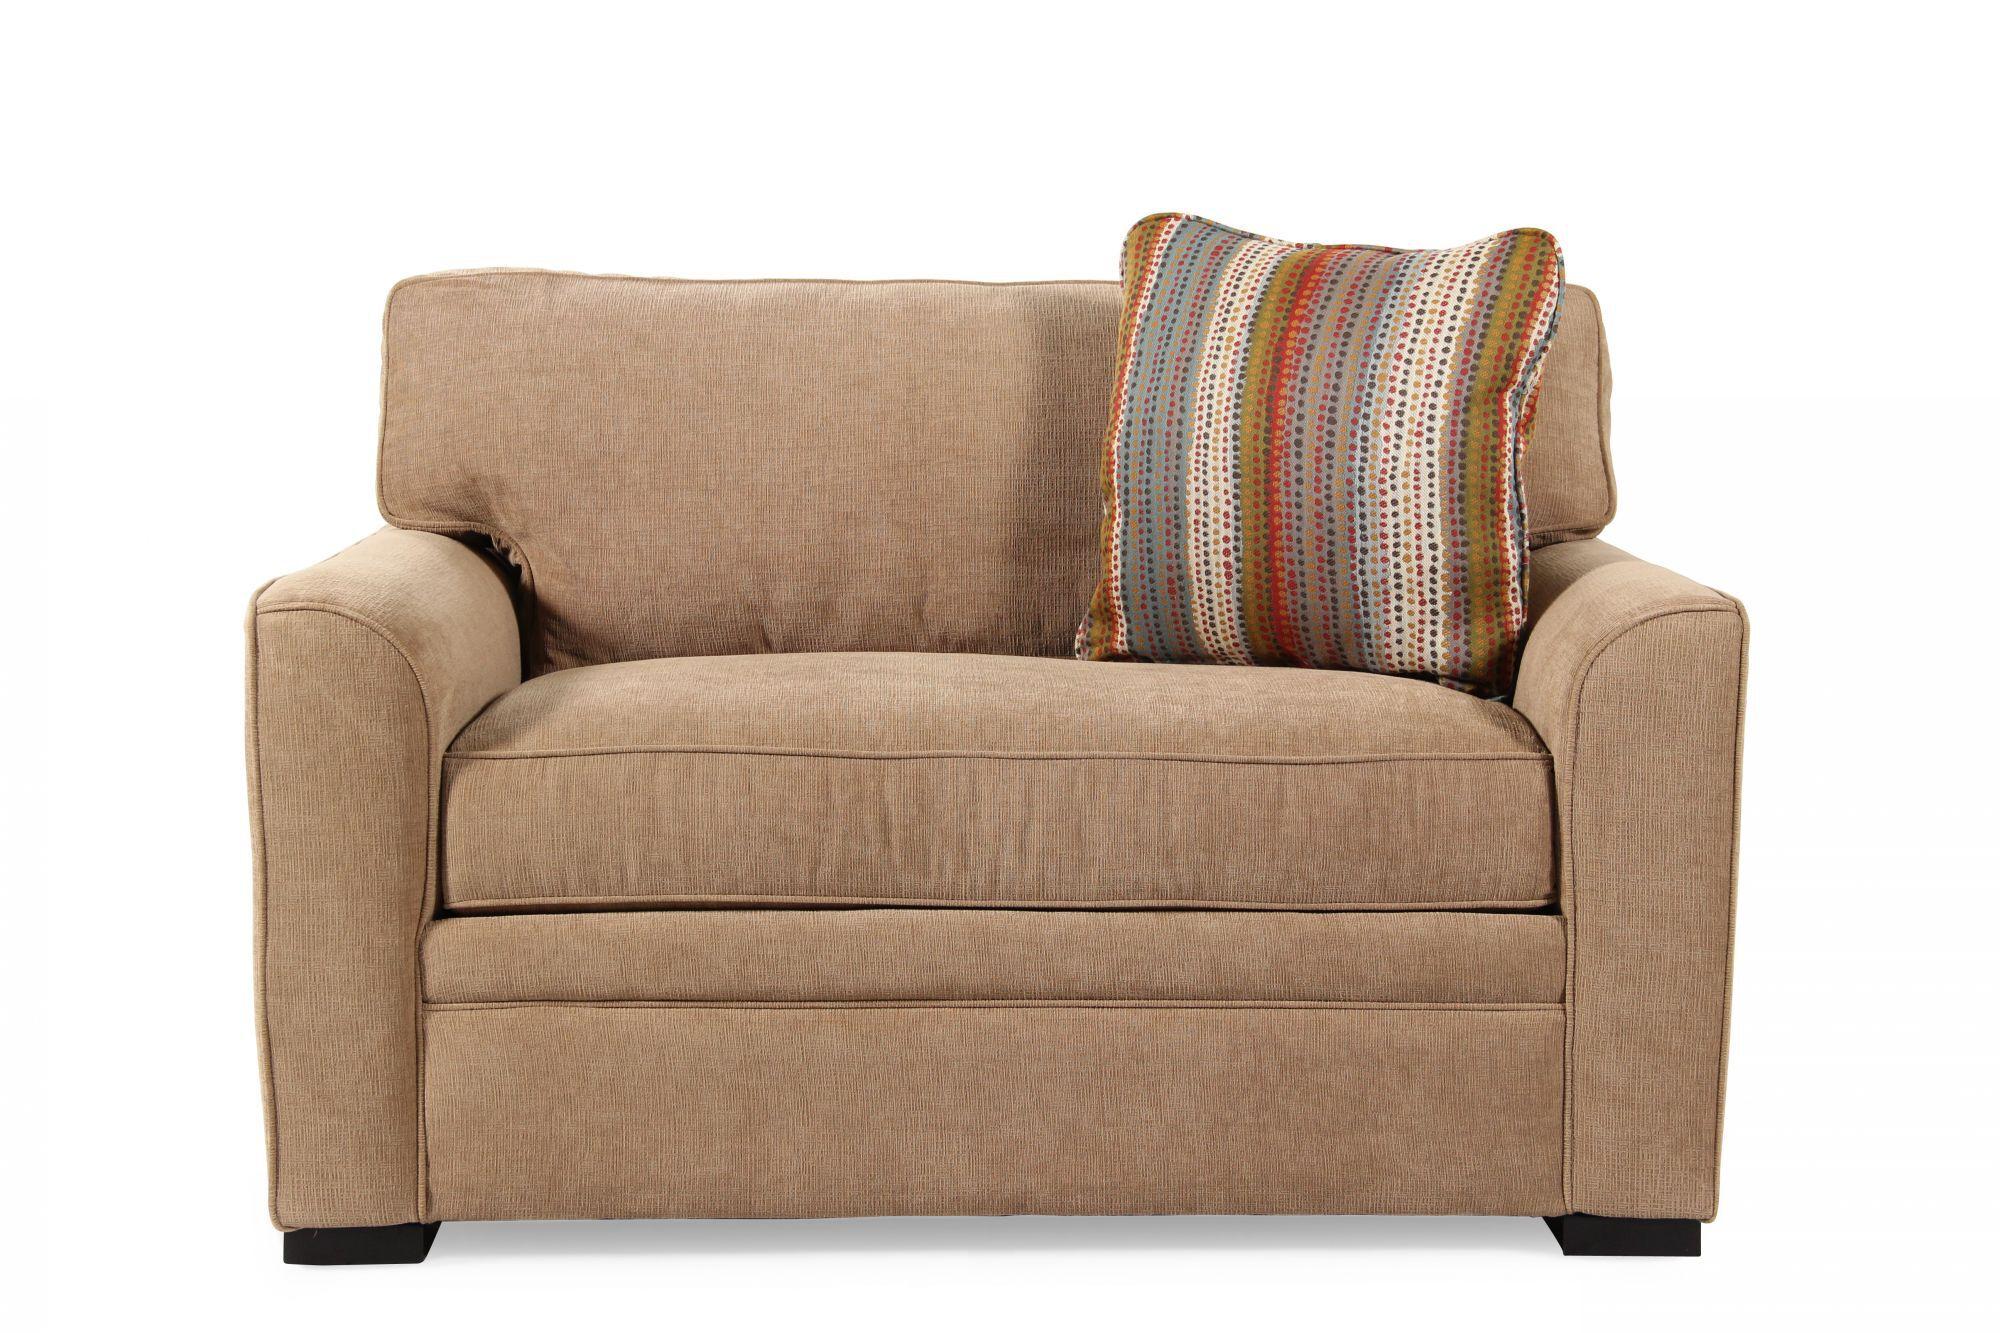 Jonathan Louis Blissful Brown Full Memory Foam Sleeper Sofa ...